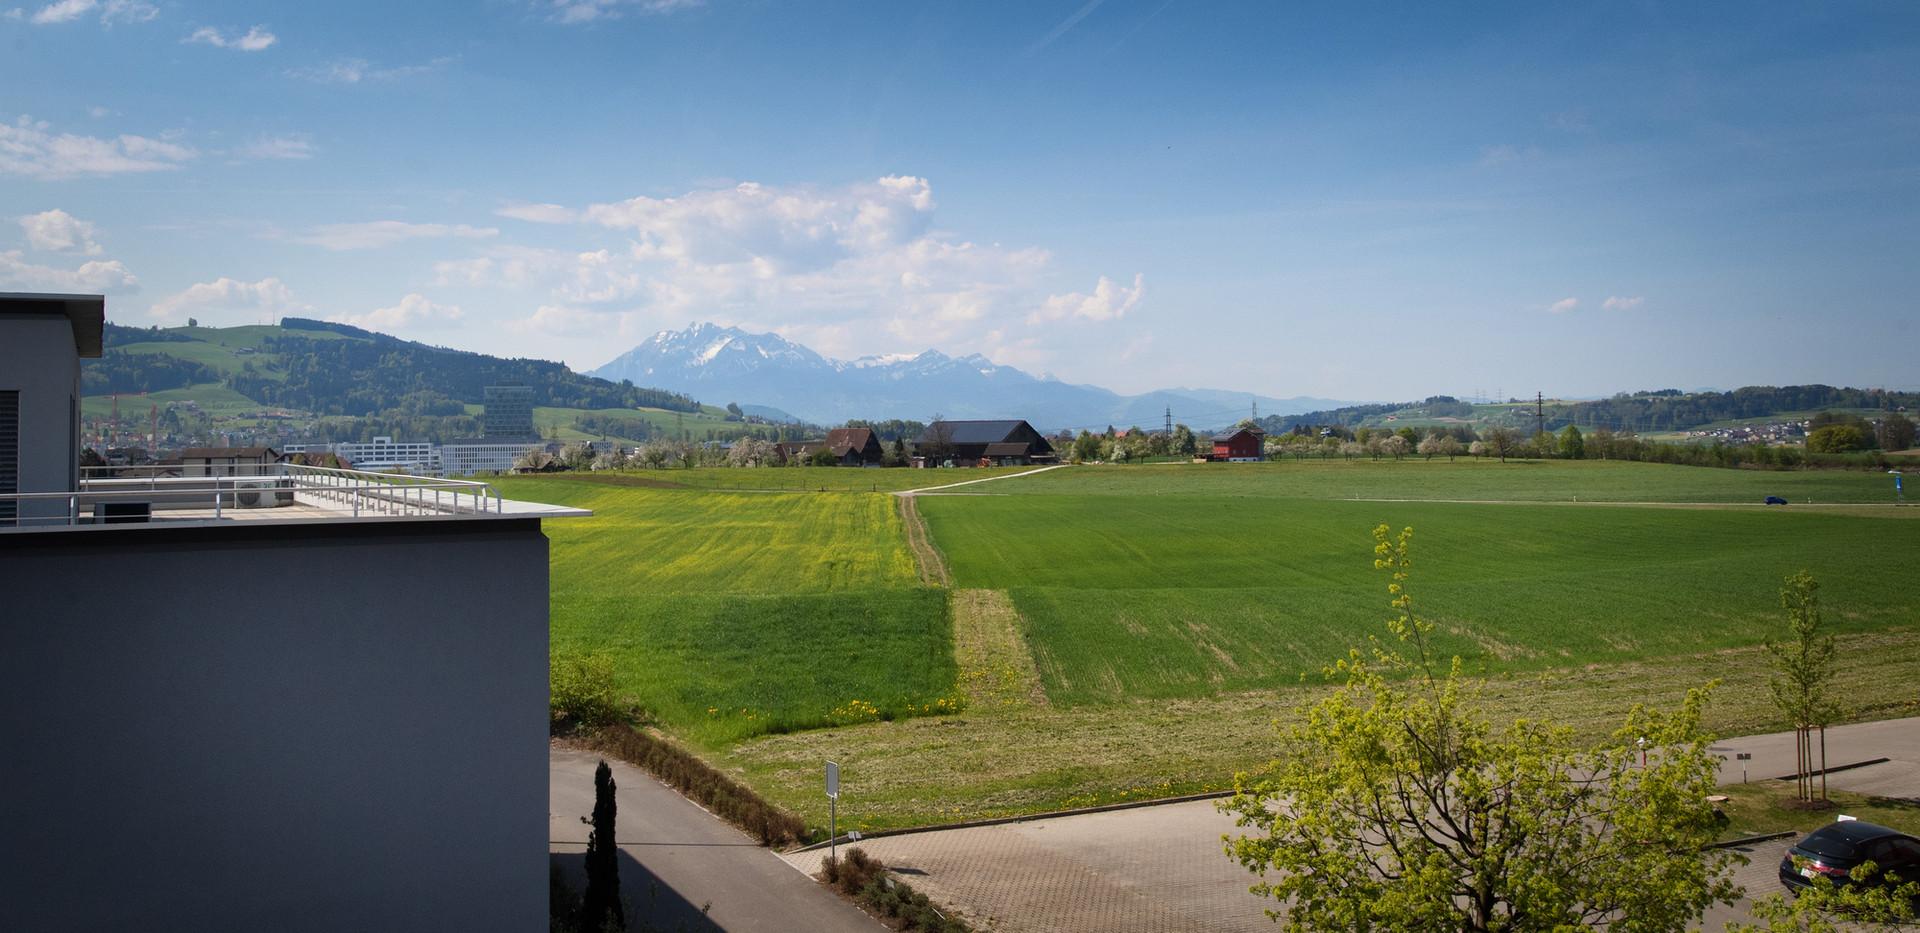 Blick Richtung Luzern und Pilatus  /  View towards Lucerne and Pilatus